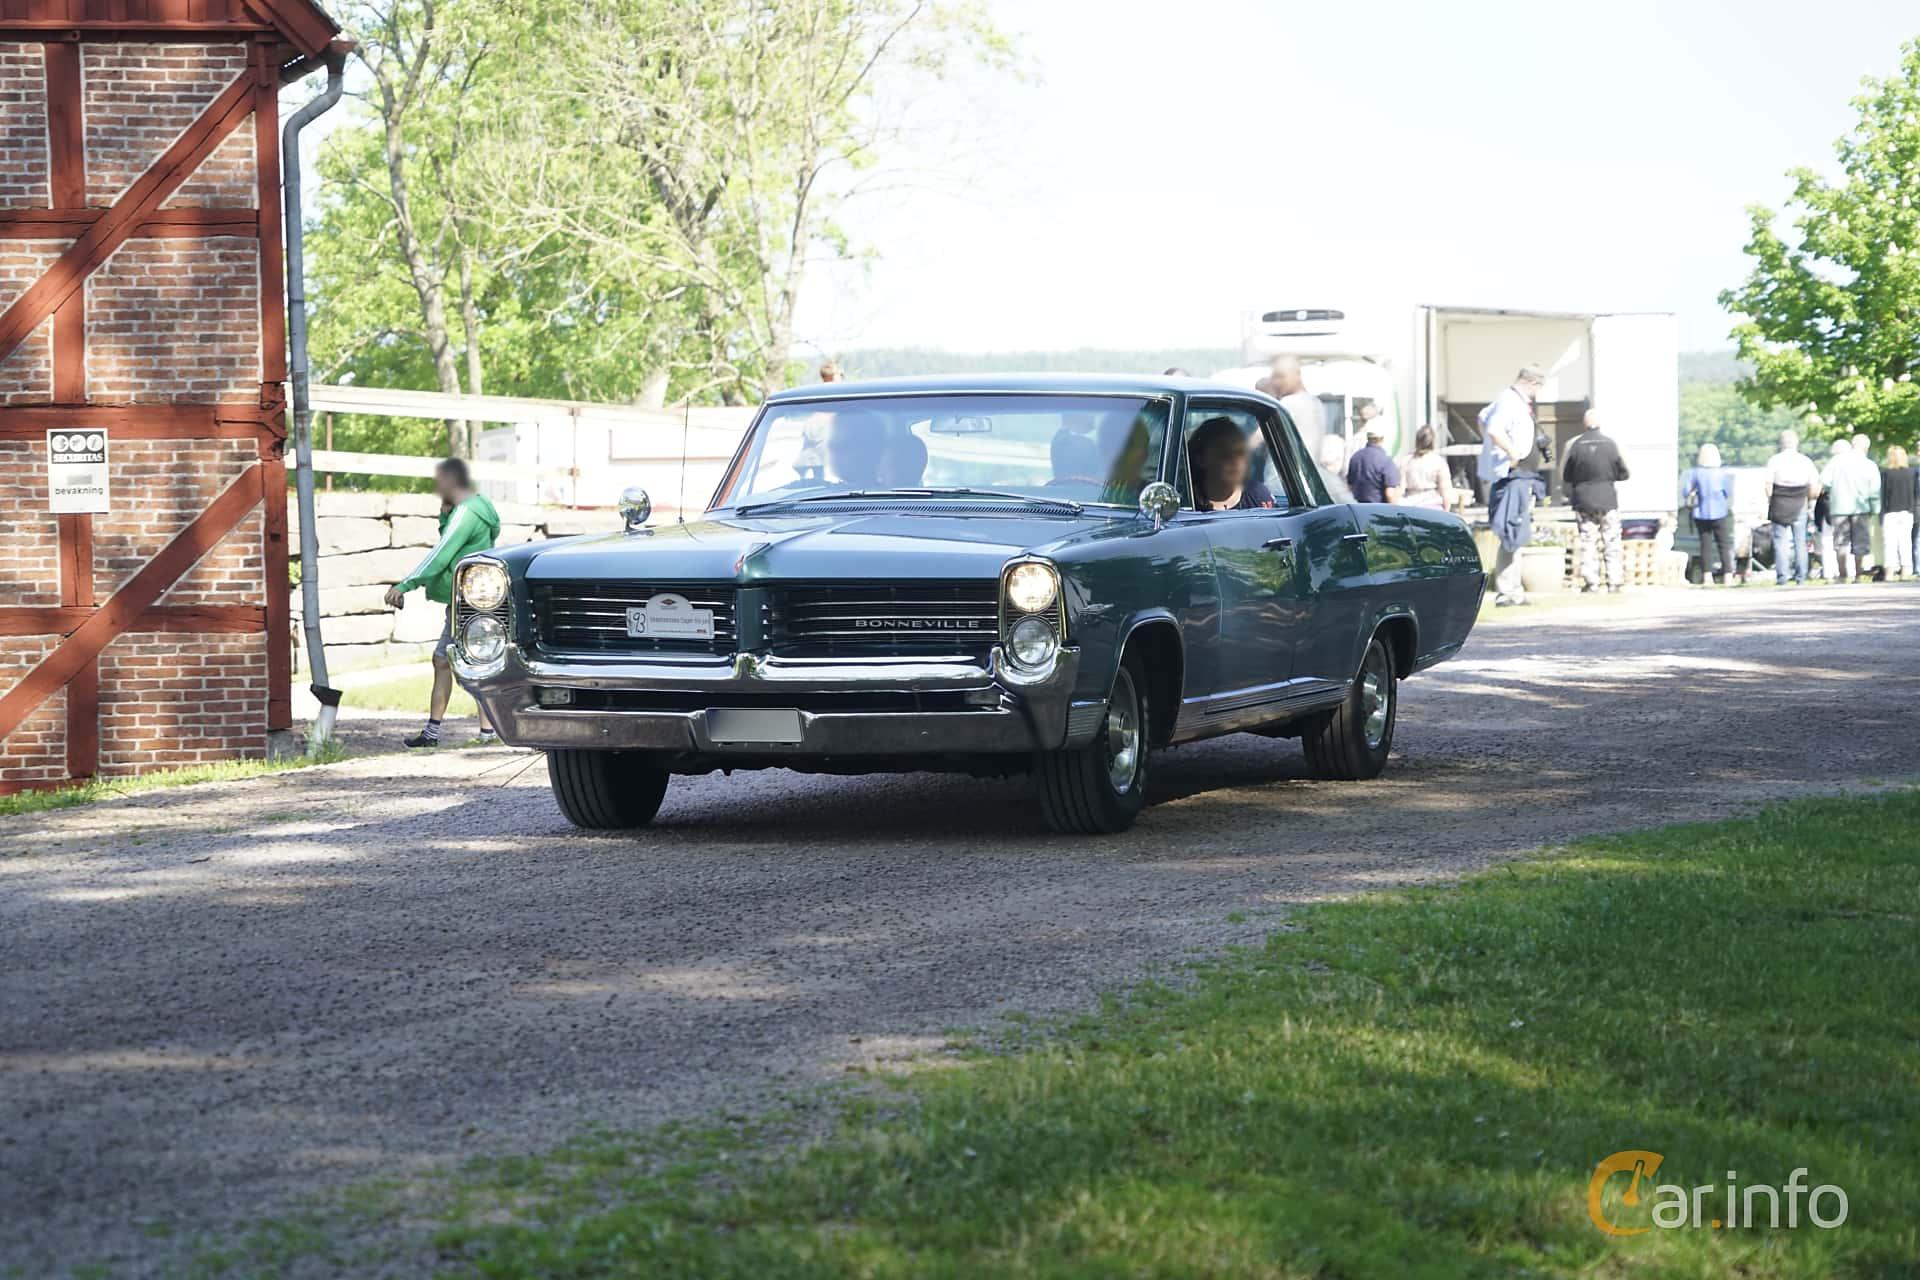 Pontiac Bonneville Vista 64 V8 Hydra Matic 310hp 1964 At